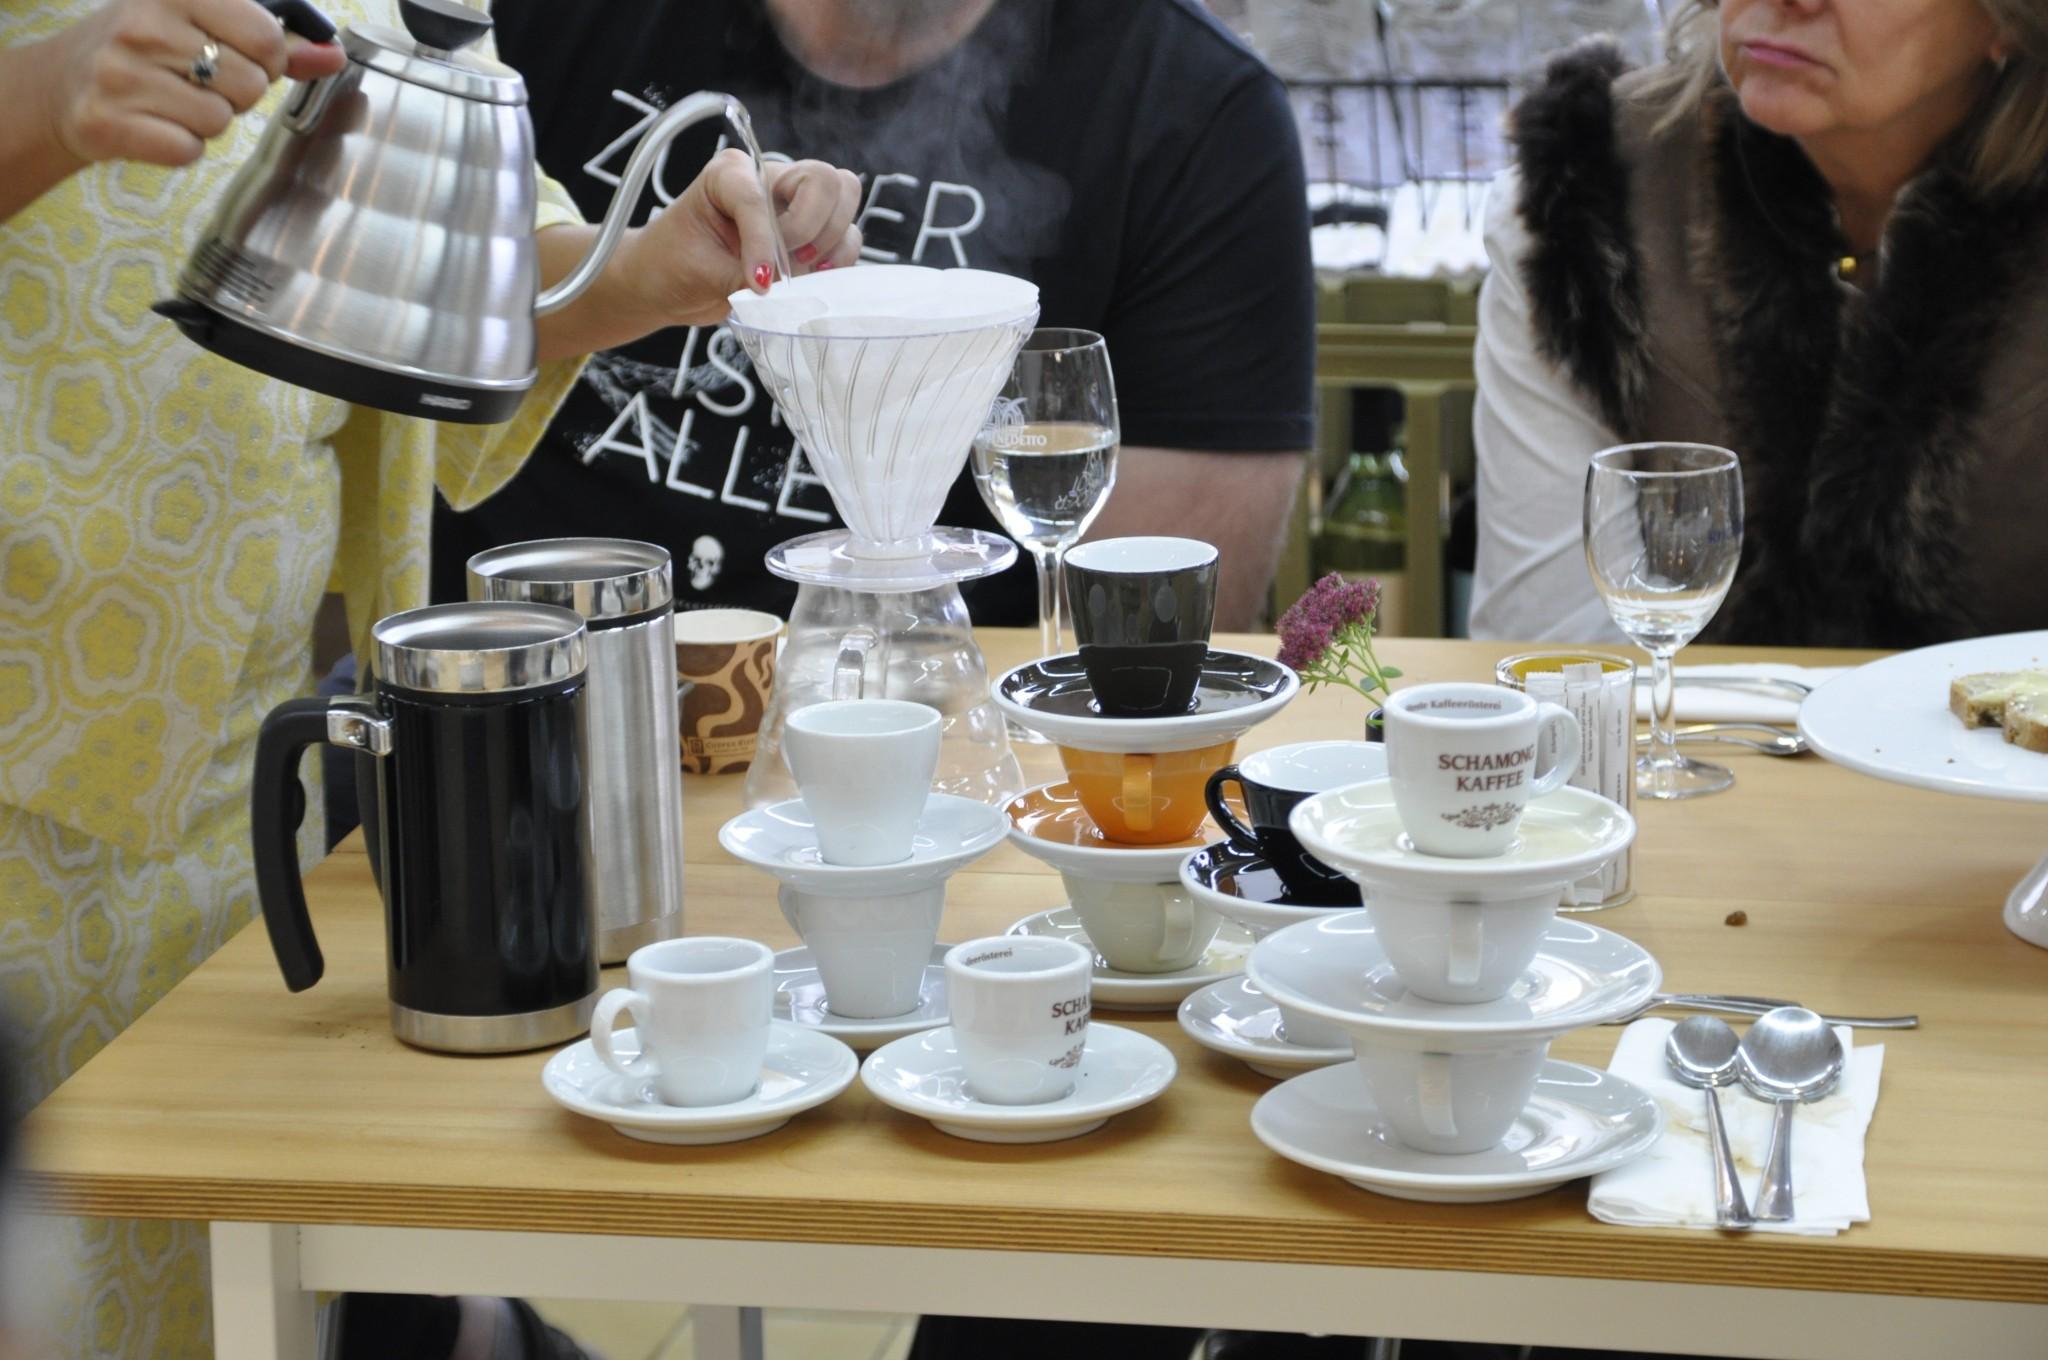 Filterkaffee, der neue Kaffeetrend?